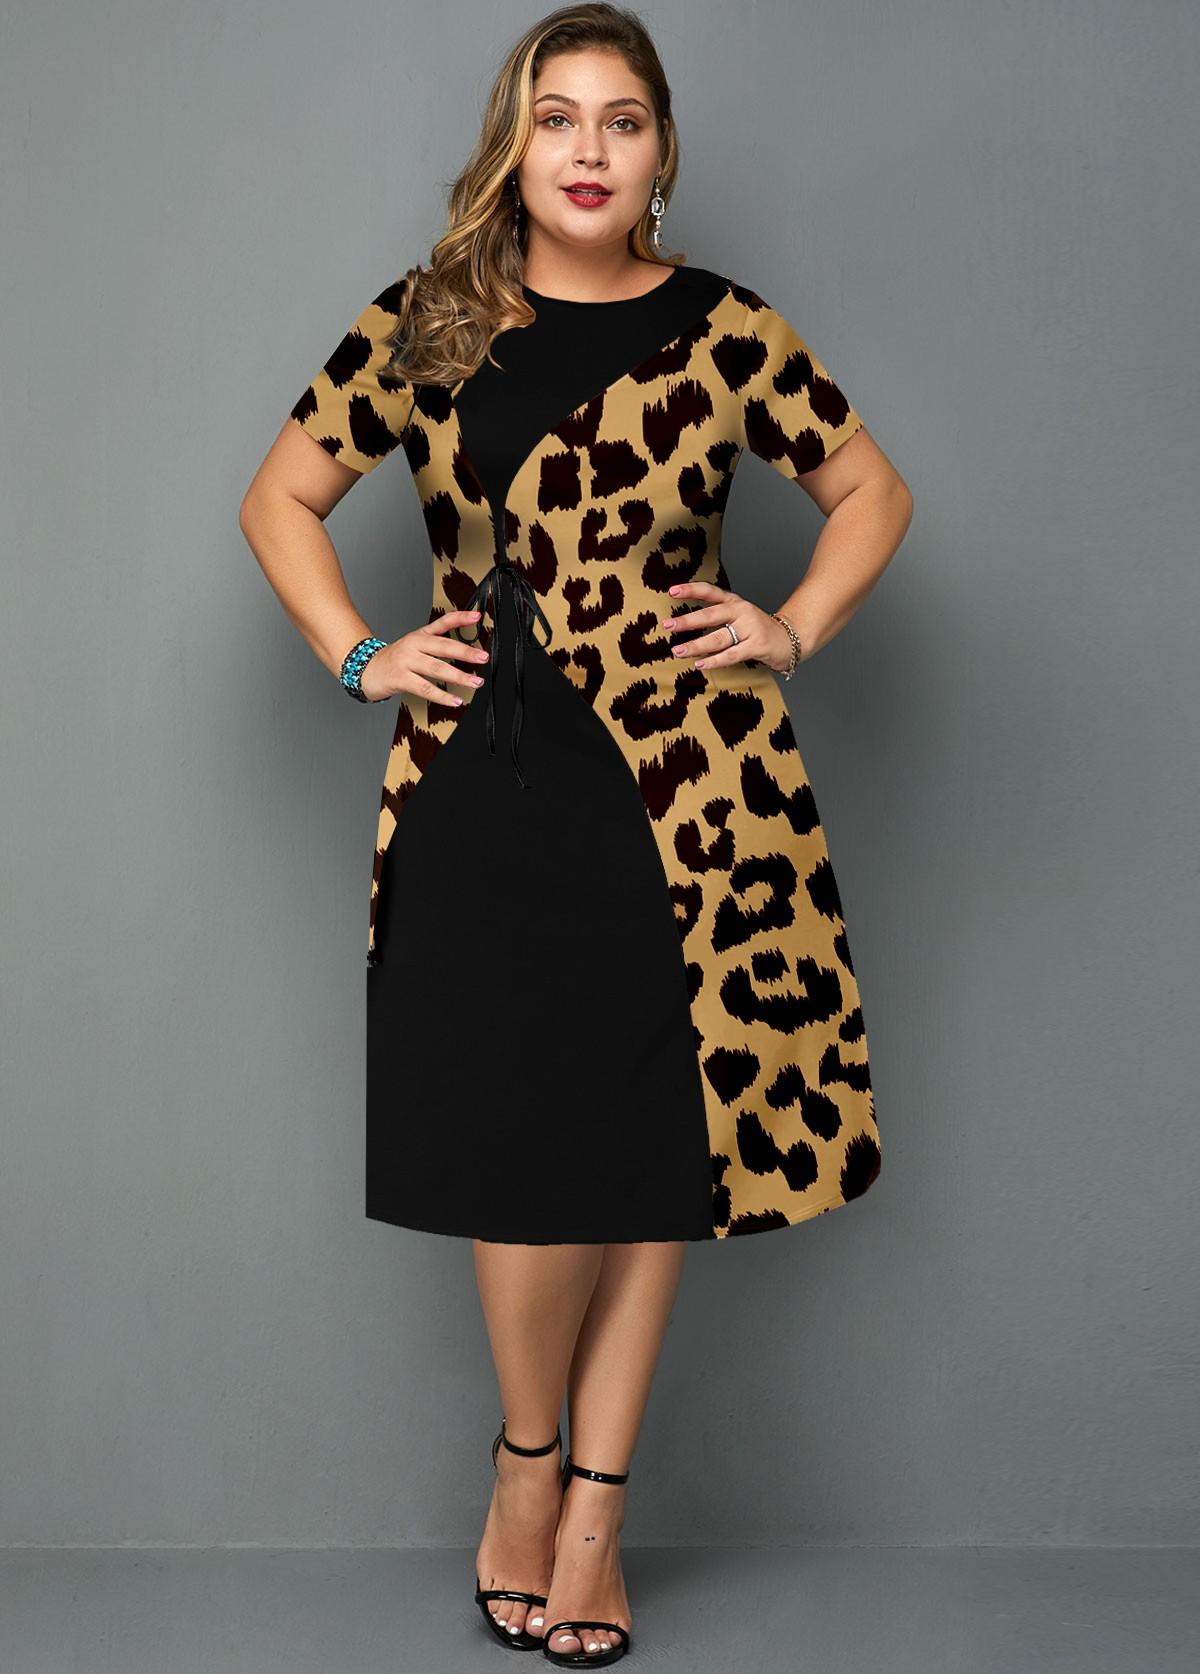 ROTITA Plus Size Leopard Round Neck Short Sleeve Dress